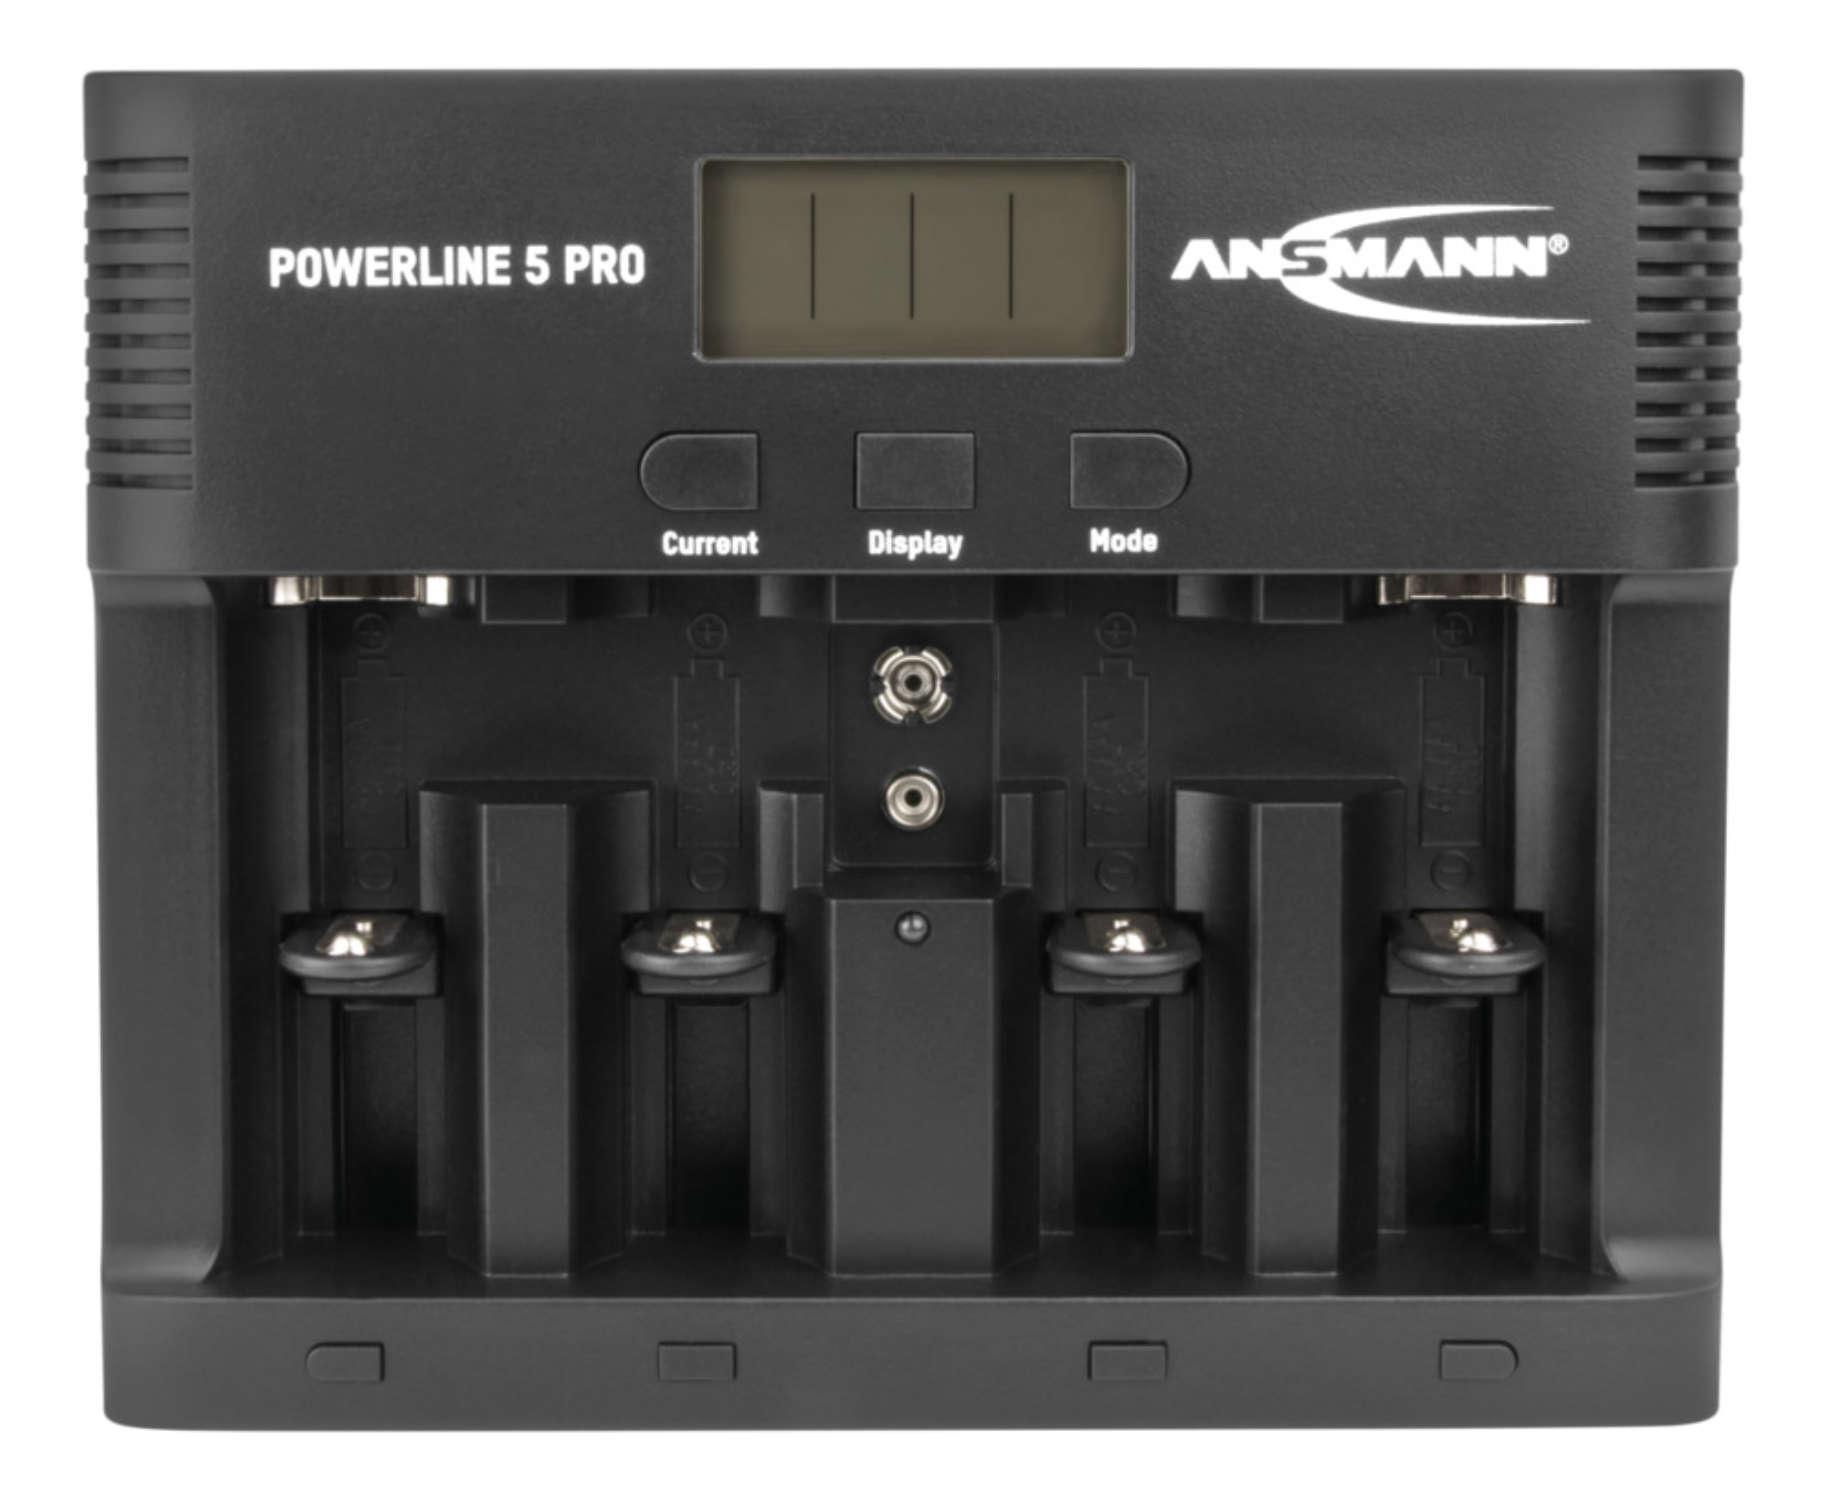 Powerline 5 Pro